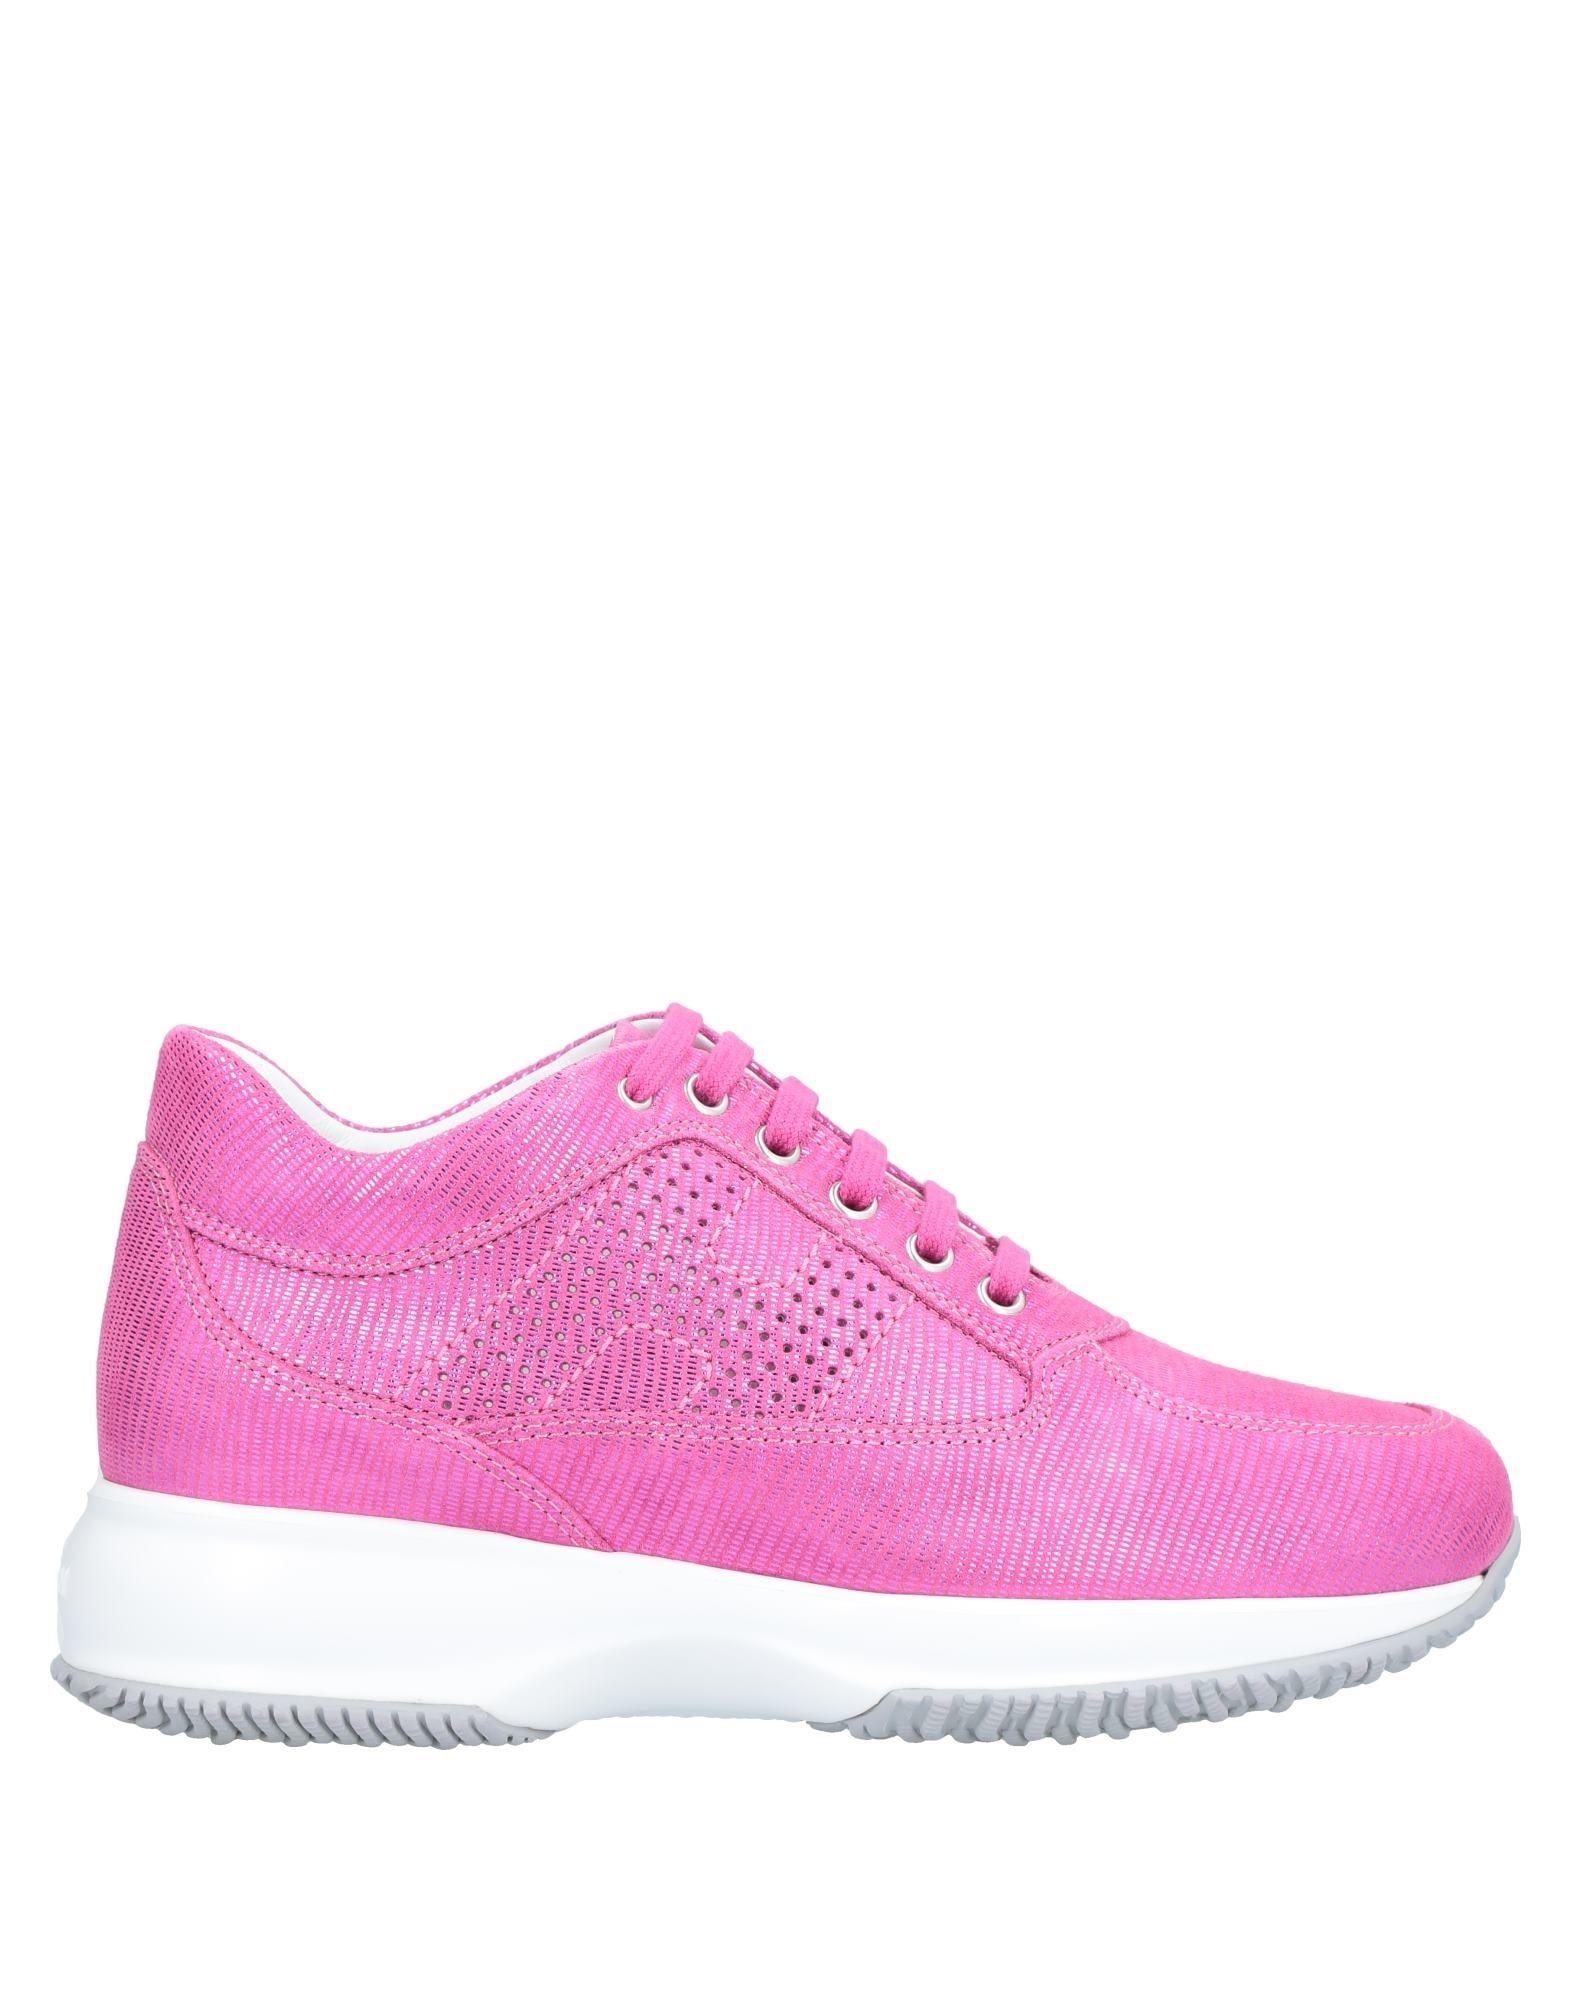 Moda Sneakers Hogan Donna Donna Hogan - 11401252KP a95fcc